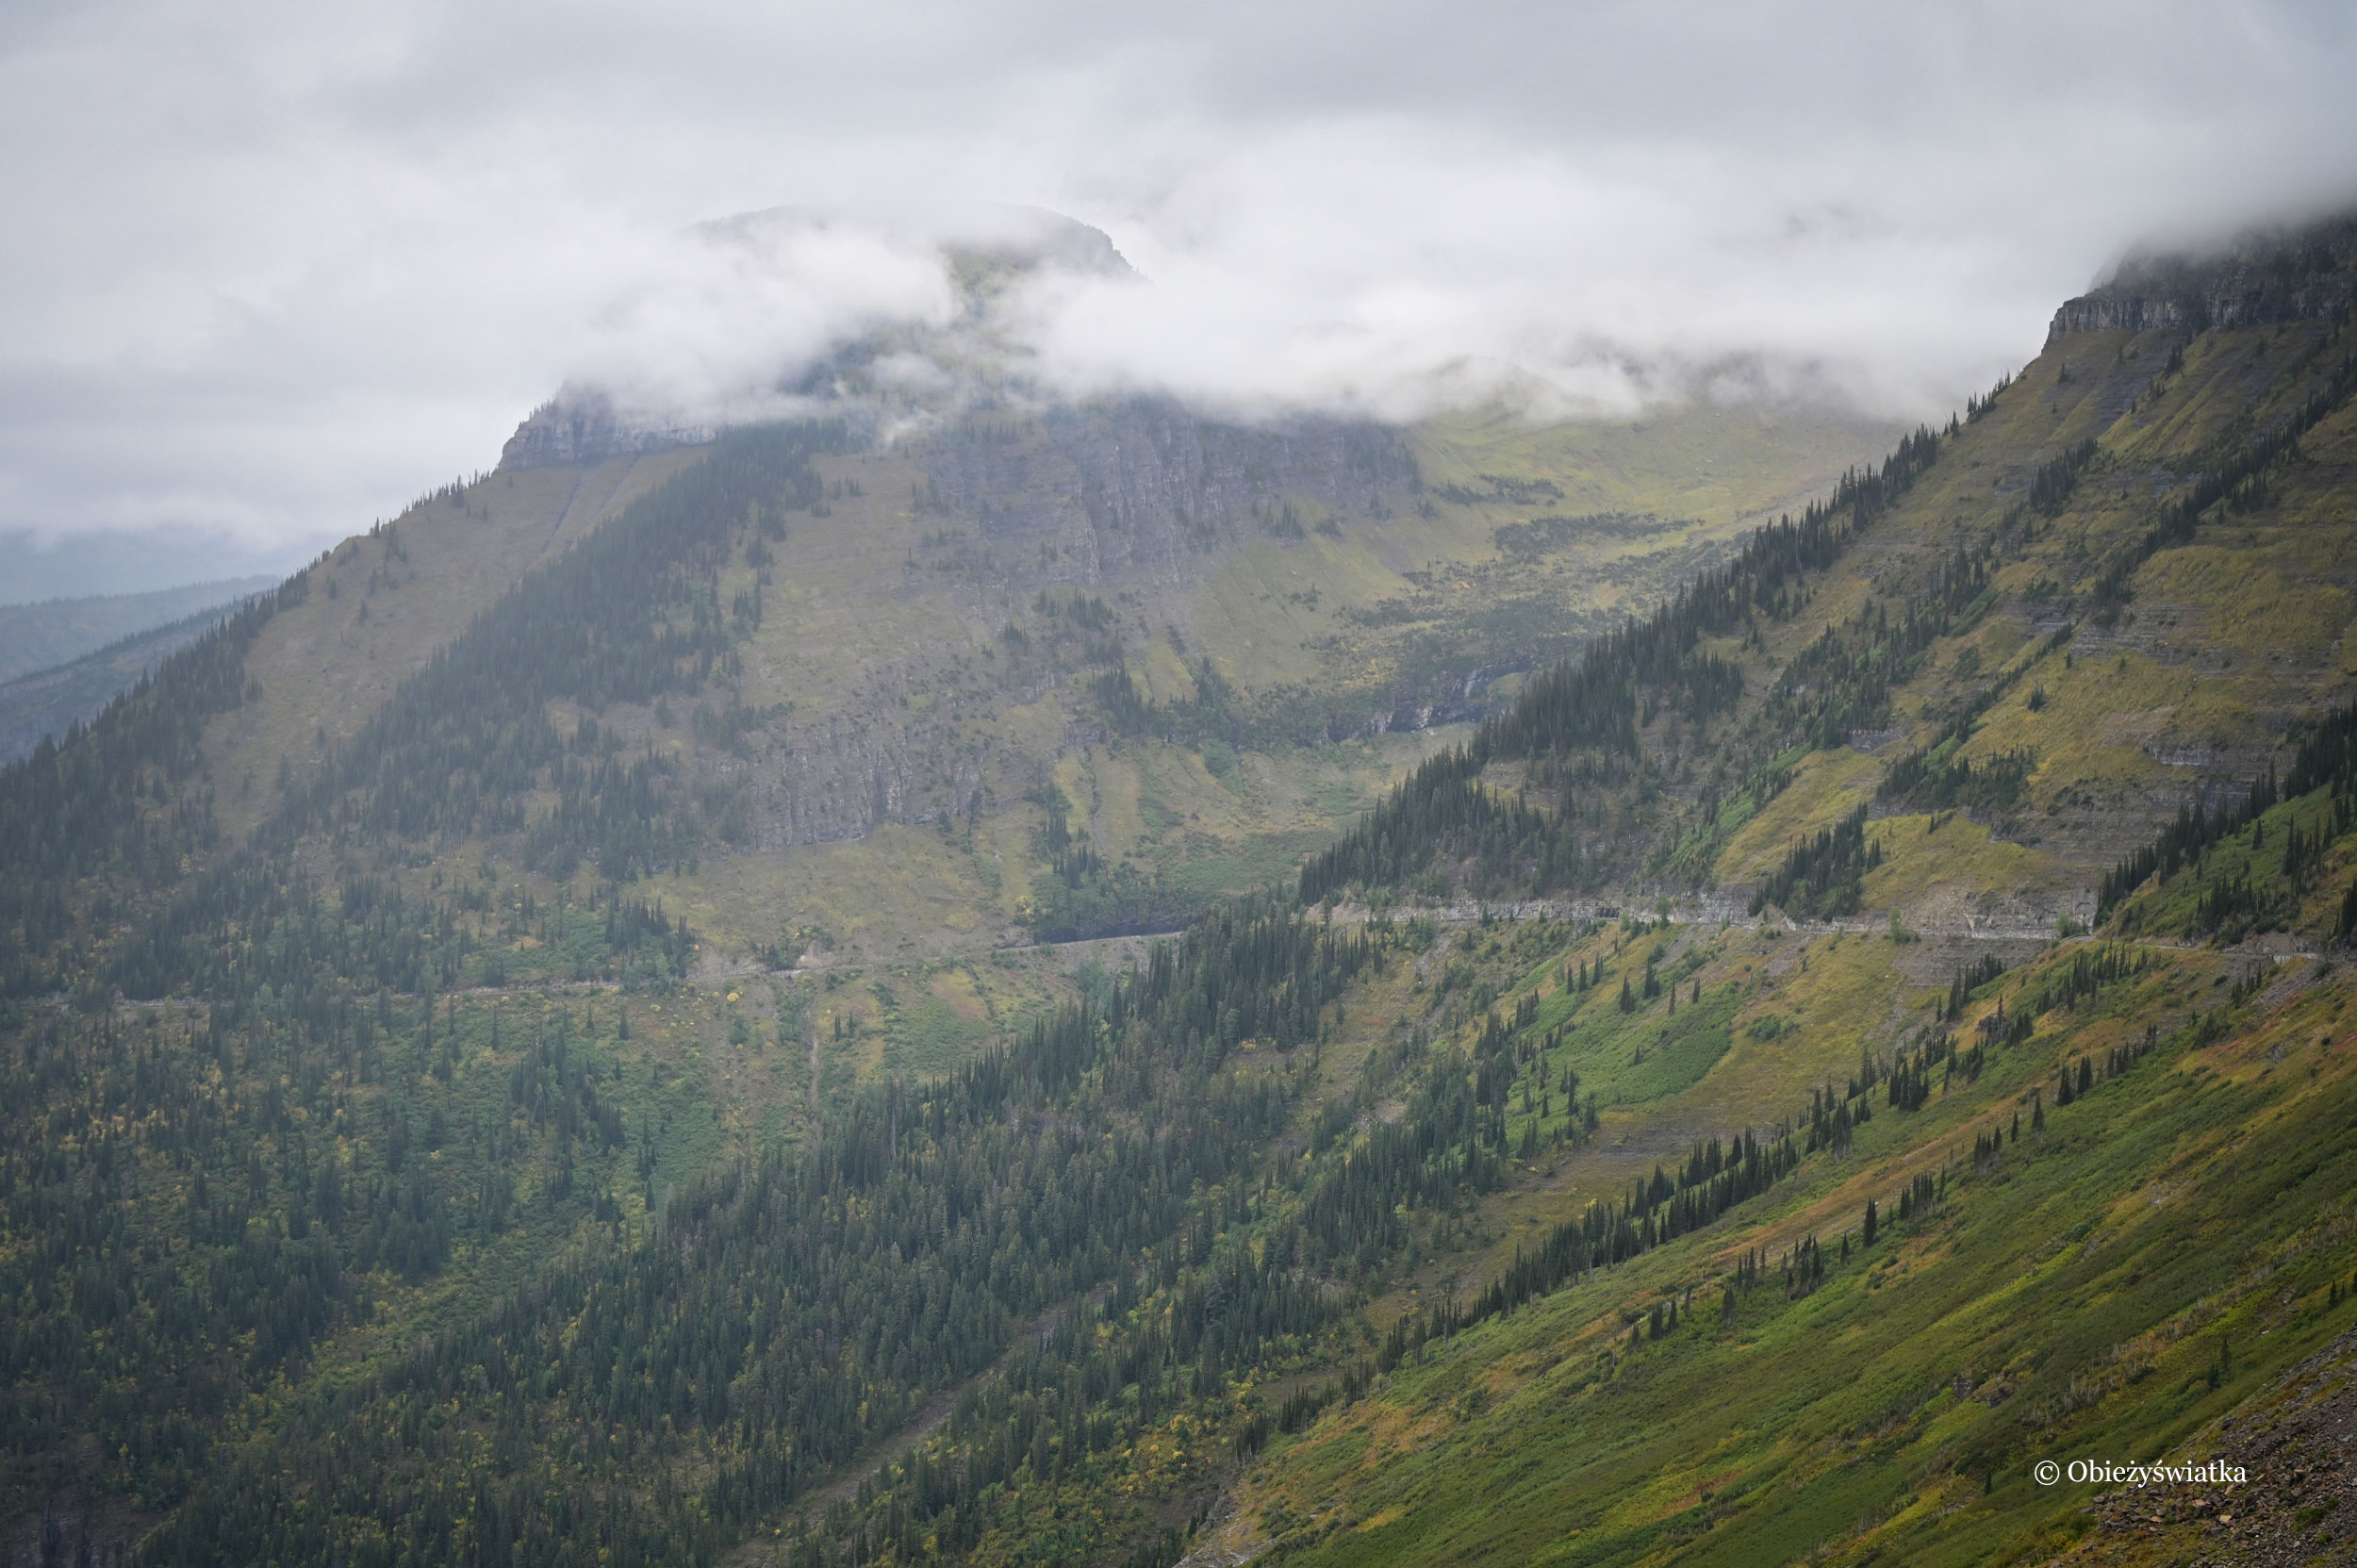 Otulone mgłą Góry Skaliste / Rocky Mountains